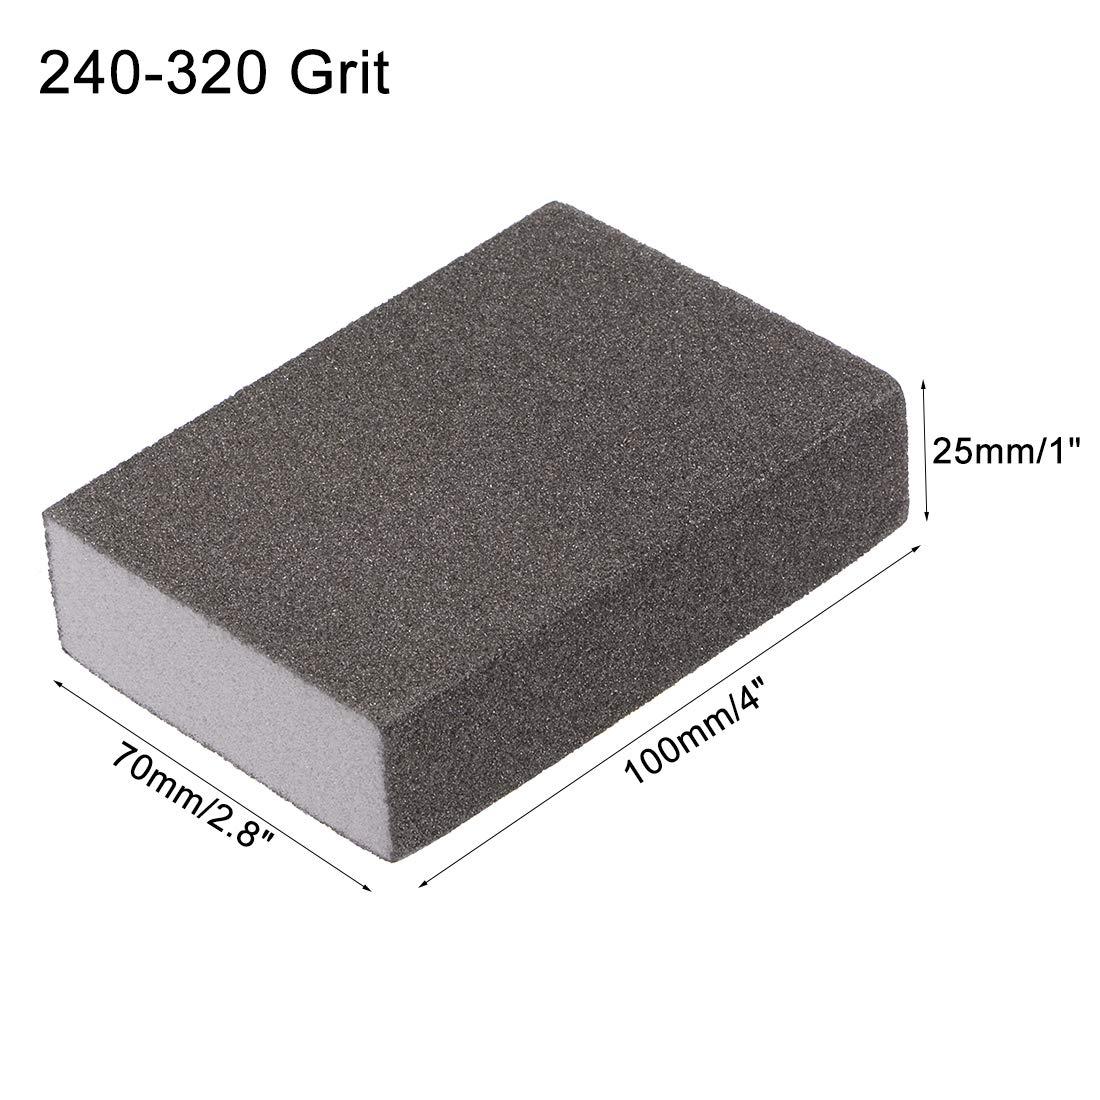 99mm x 70mm x 25mm uxcell Sanding Sponge Block 400-600 Grit